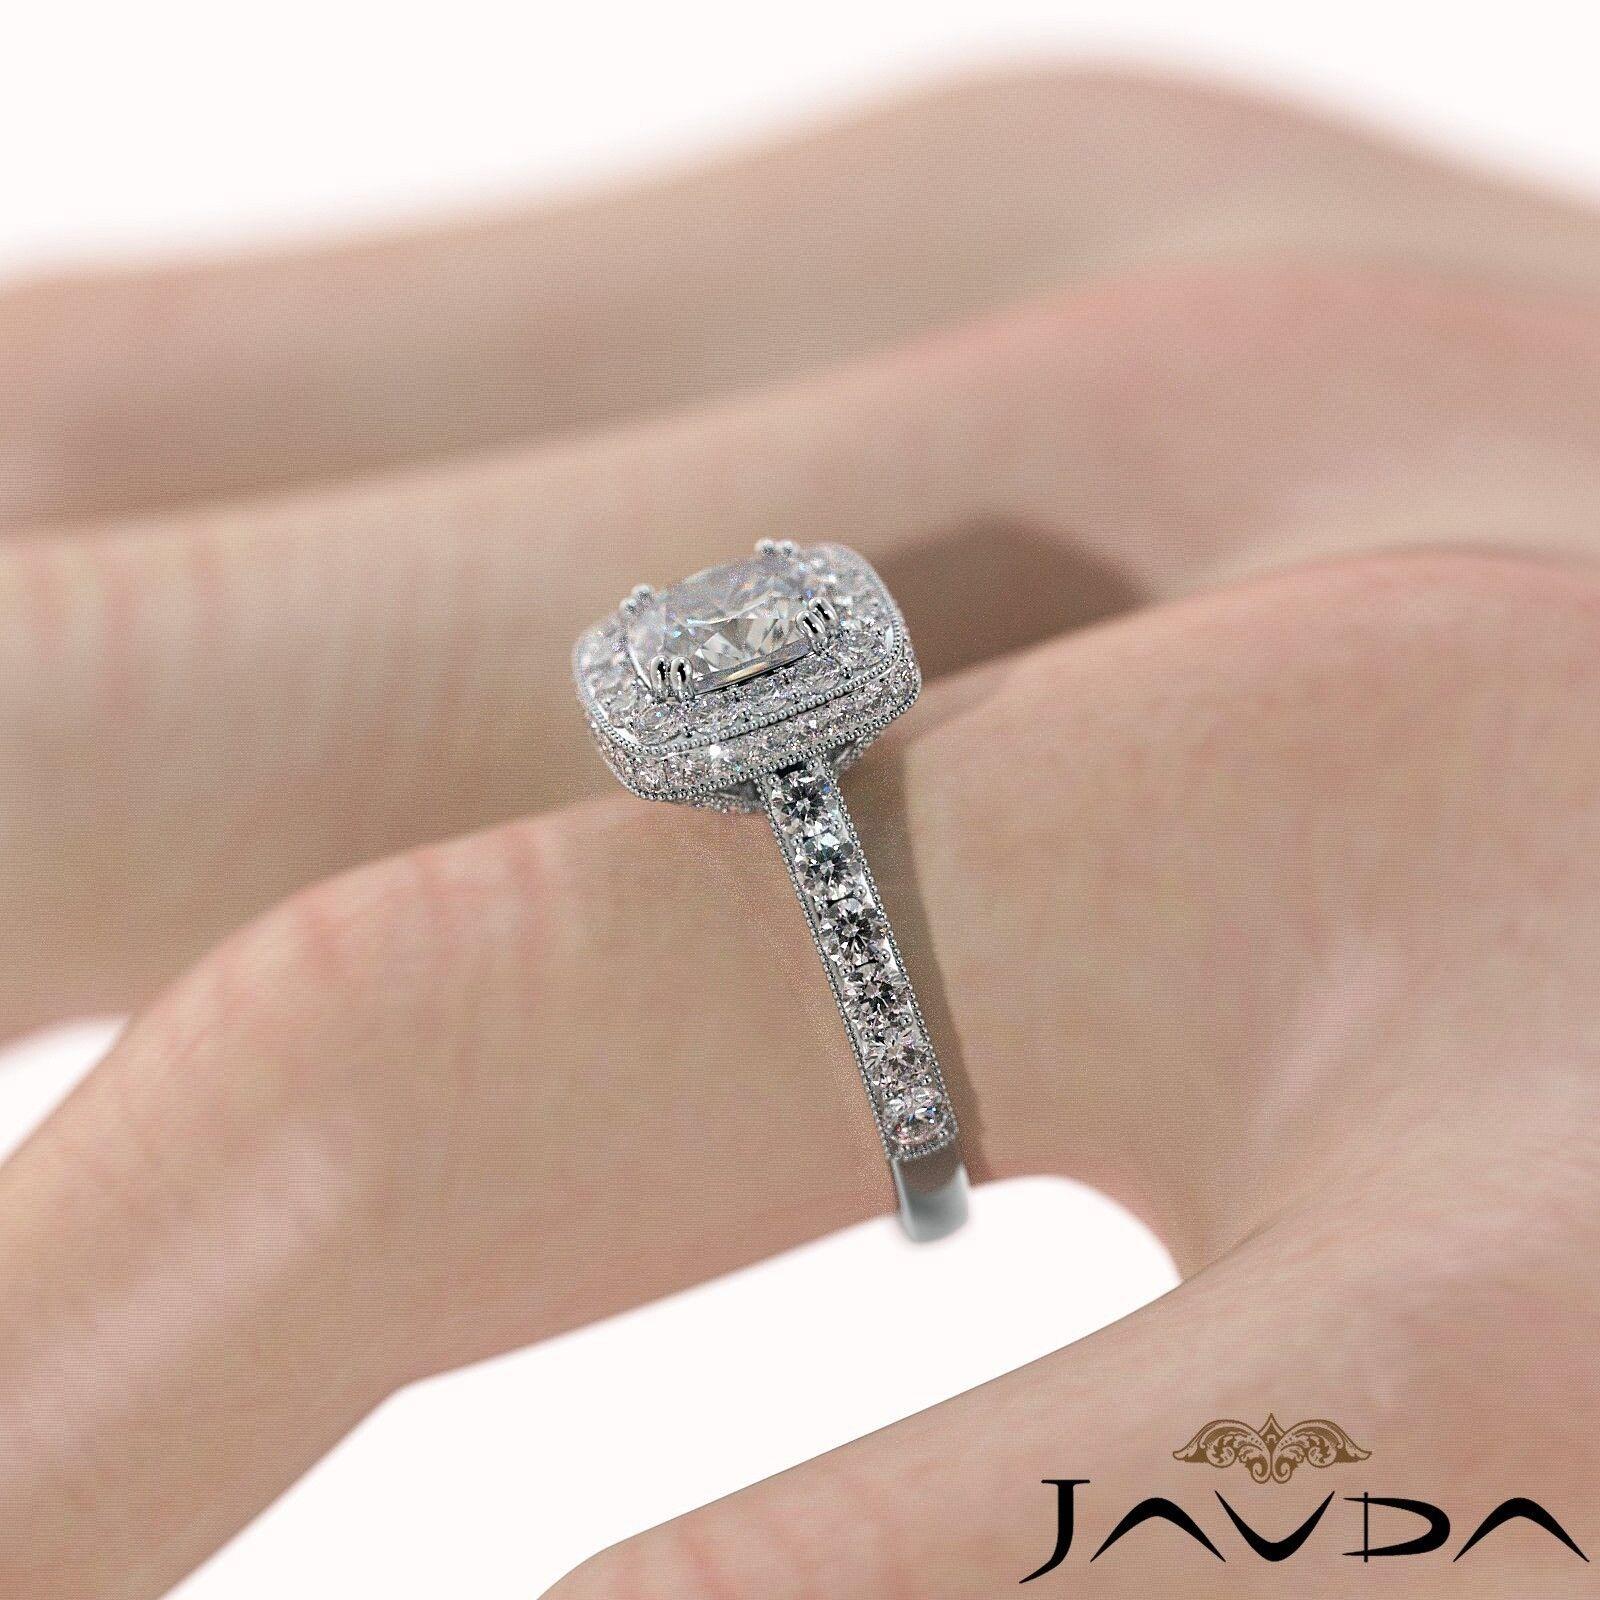 1.94ctw Milgrain Floral Basket Cushion Diamond Engagement Ring GIA E-VVS1 W Gold 5